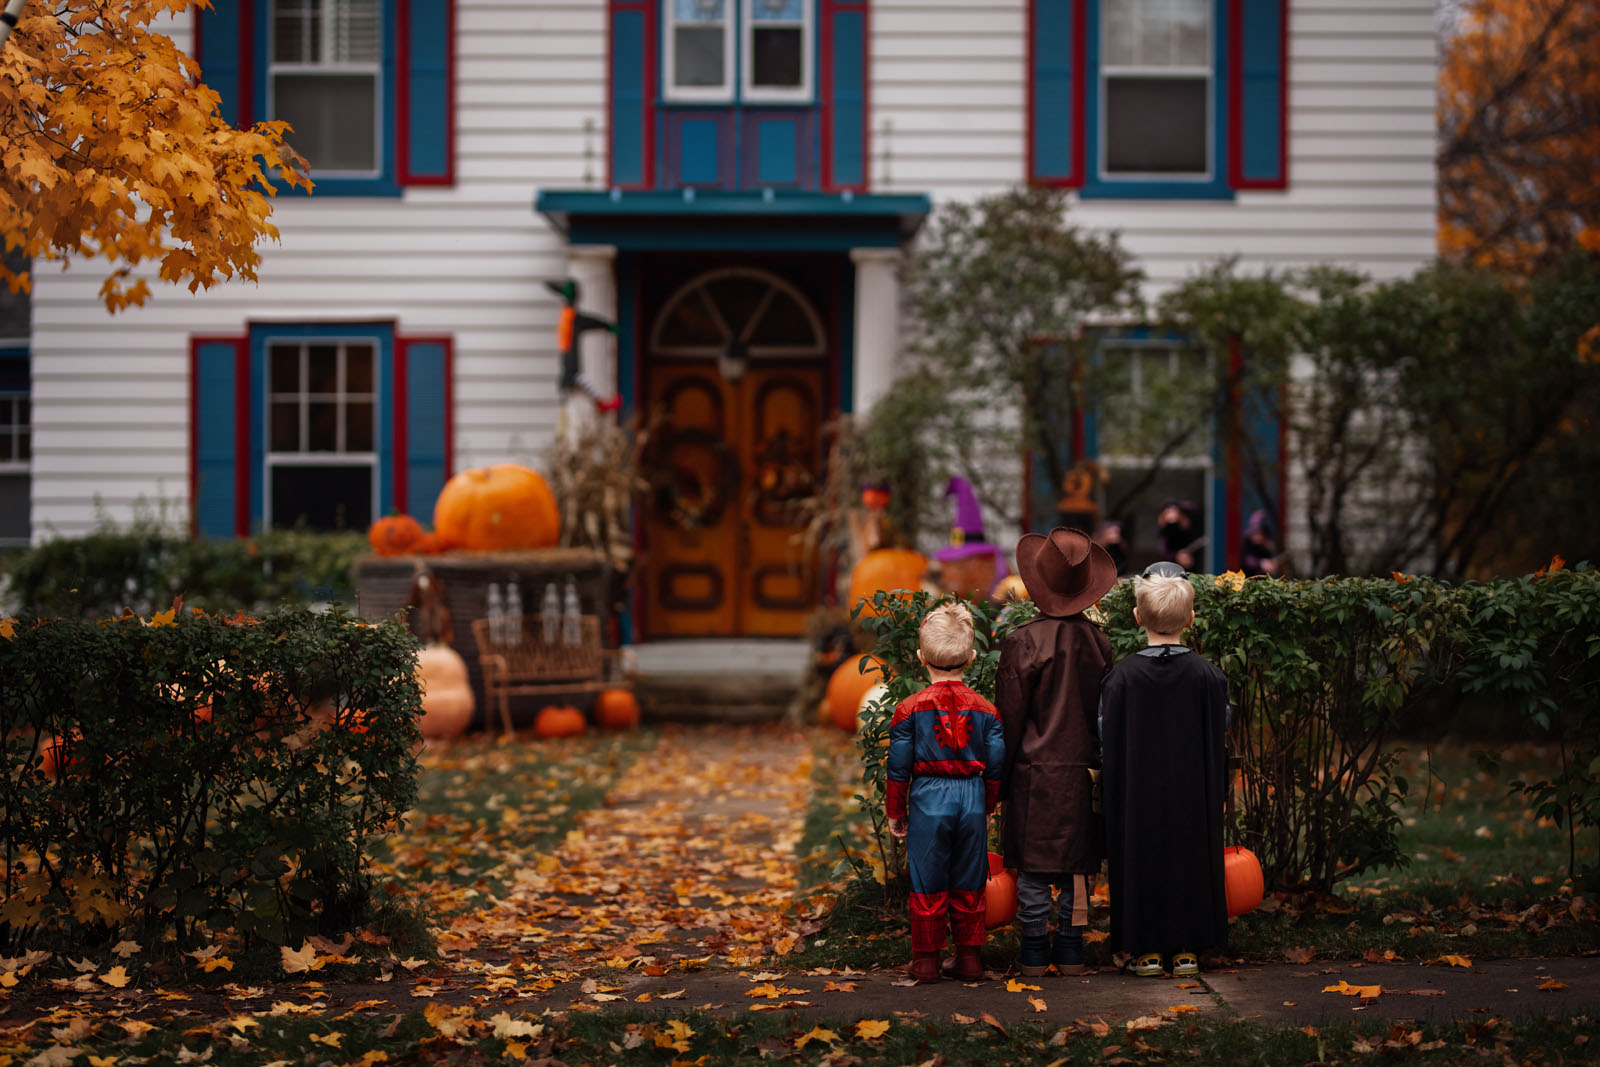 megloeks_image22 children trick or treating halloween fall activities by meg loeks